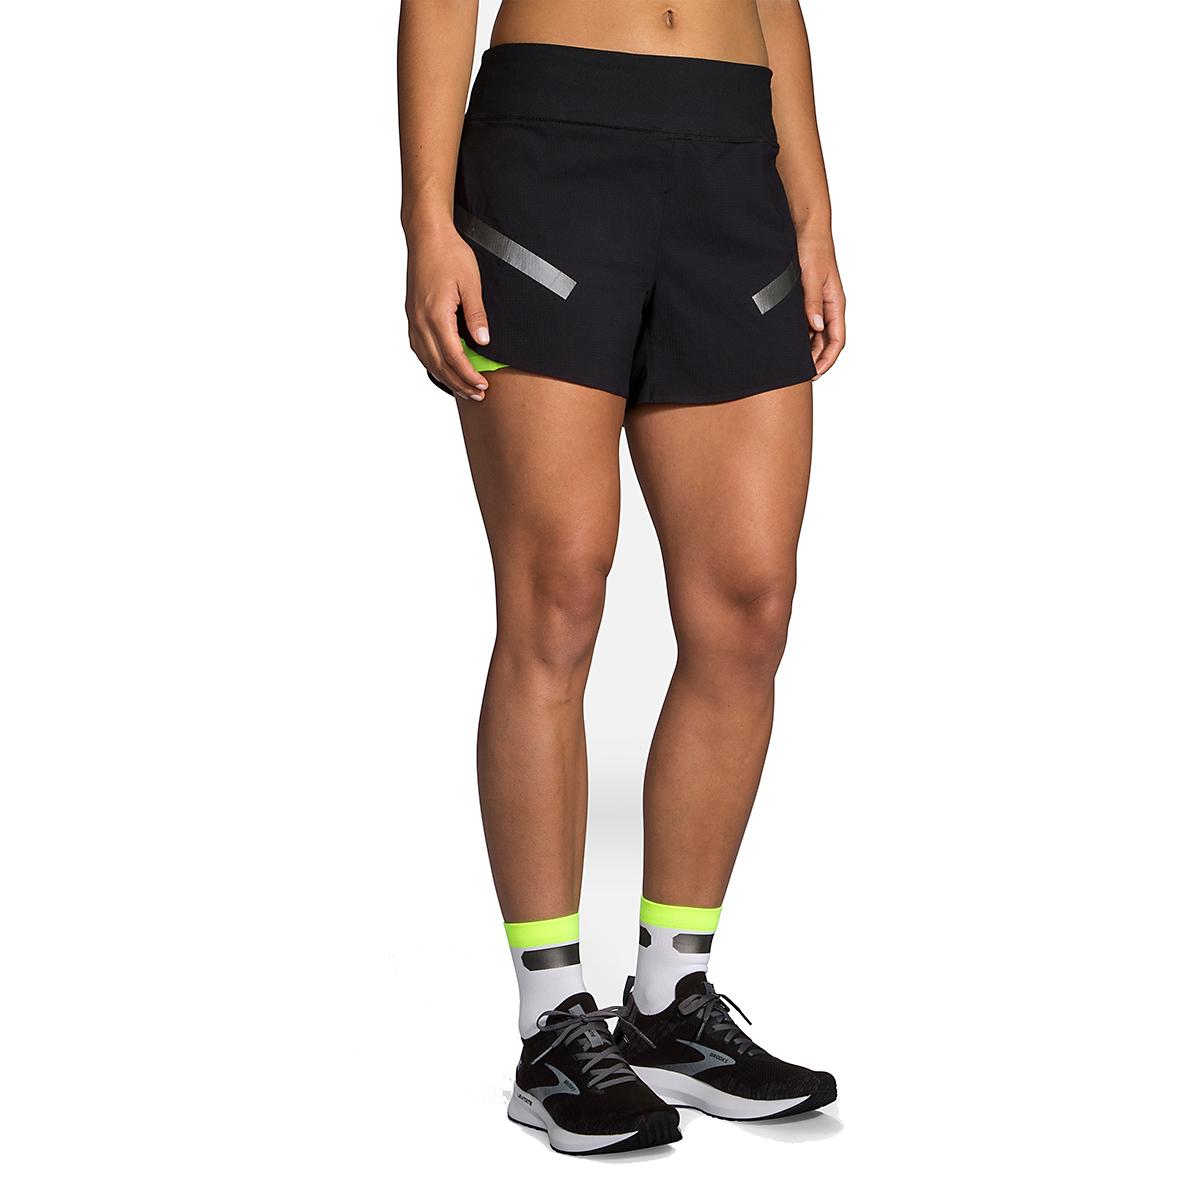 "Women's Brooks Run Visible Carbonite 4"" 2-In-1 Short  - Color: Black - Size: L, Black, large, image 1"